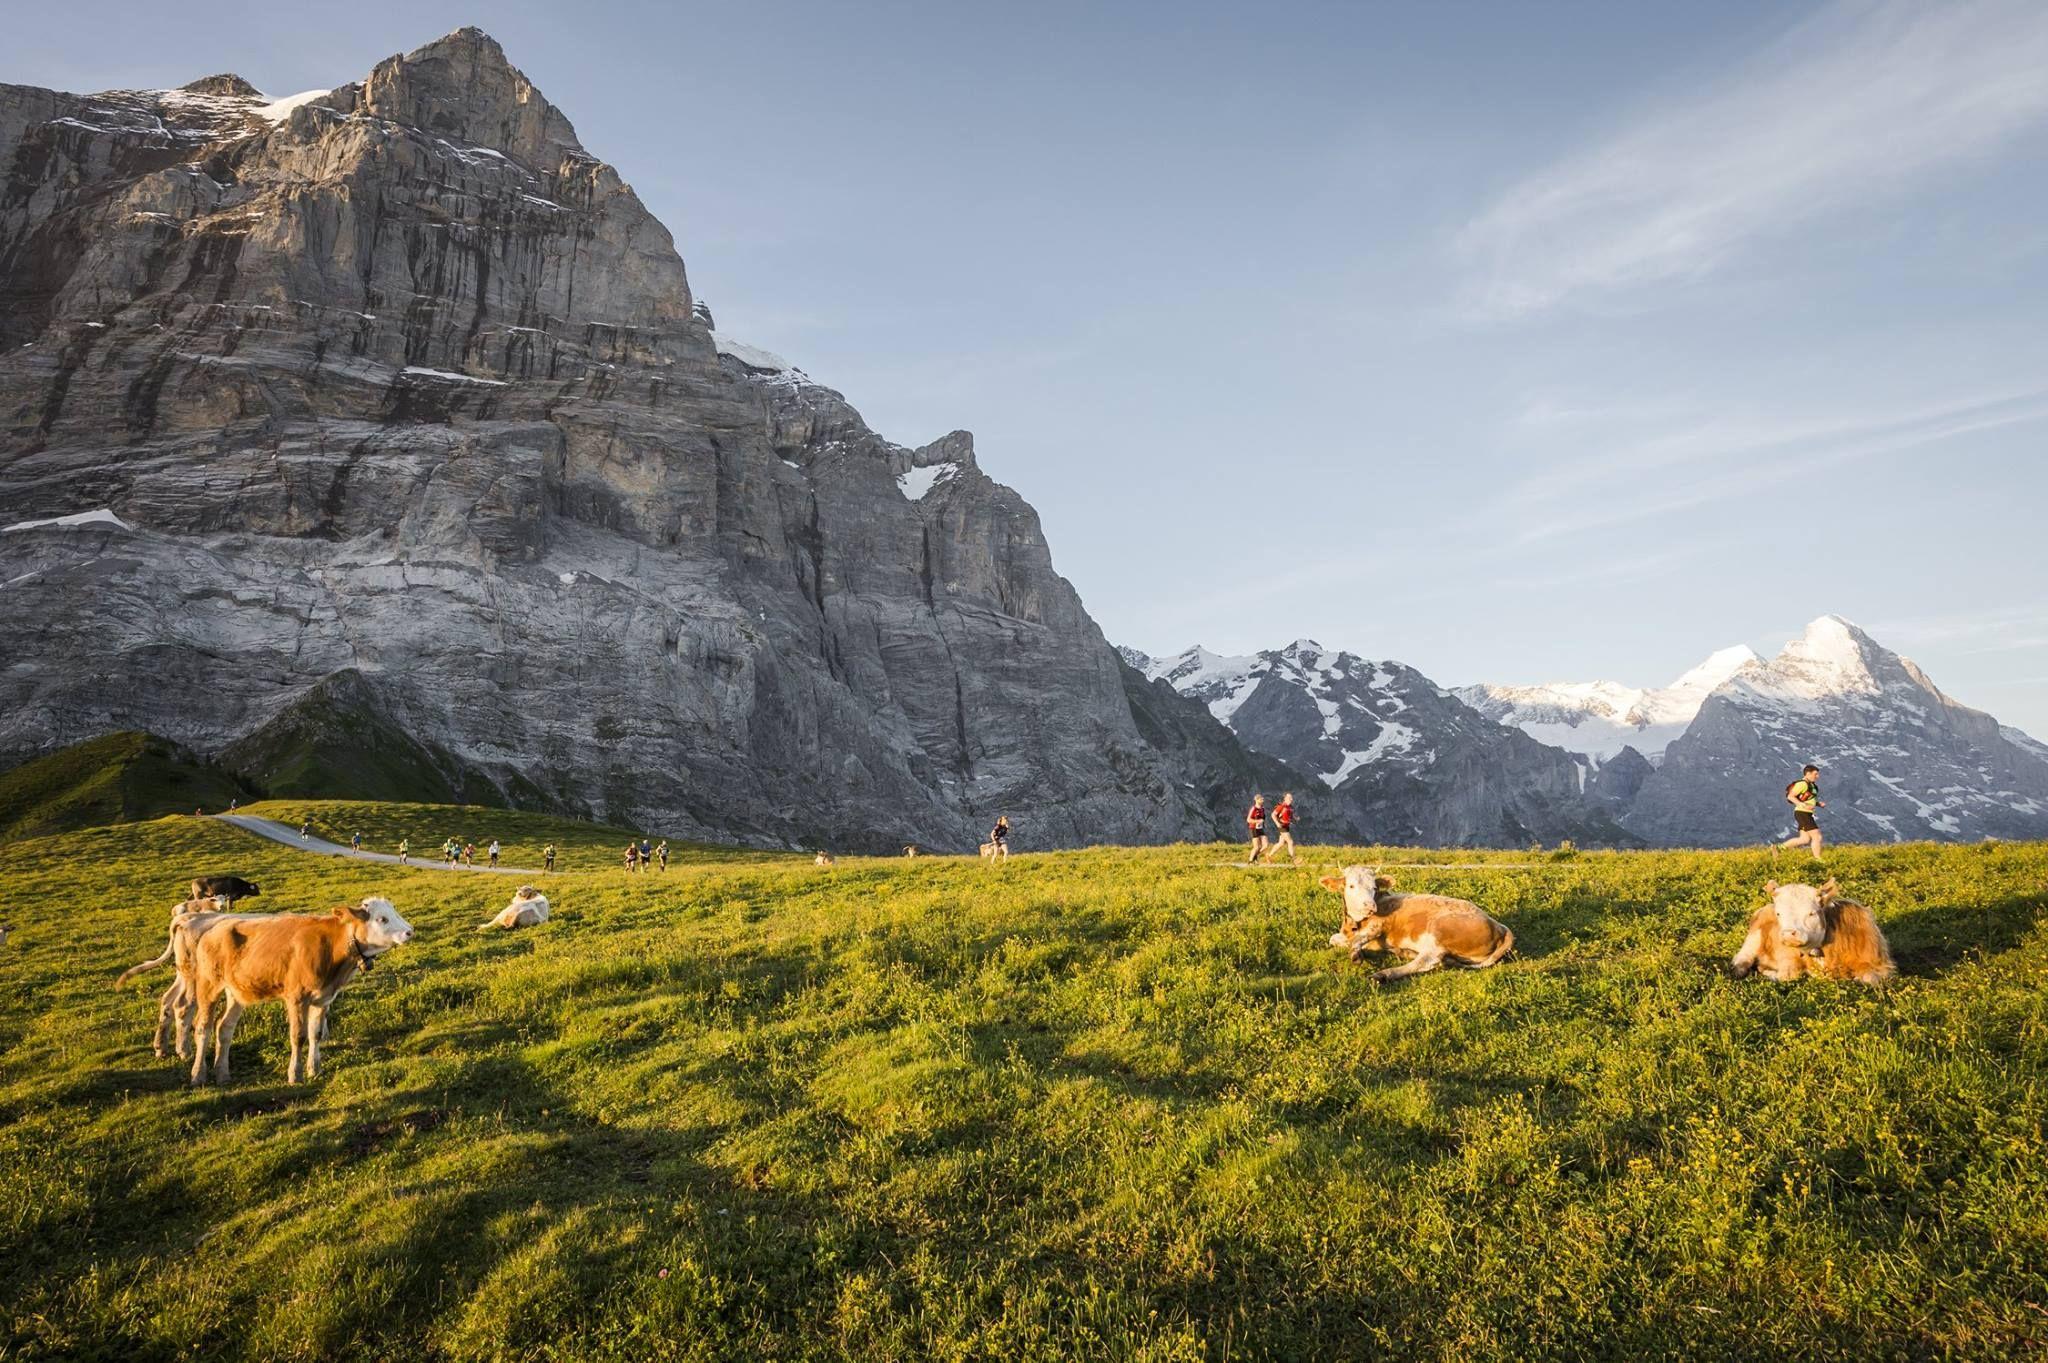 Eiger Ultra Trail https://www.facebook.com/EigerUltraTrail/photos/np.262309398.760502960/762102957237646/?type=1&ref=notif&notif_t=notify_me